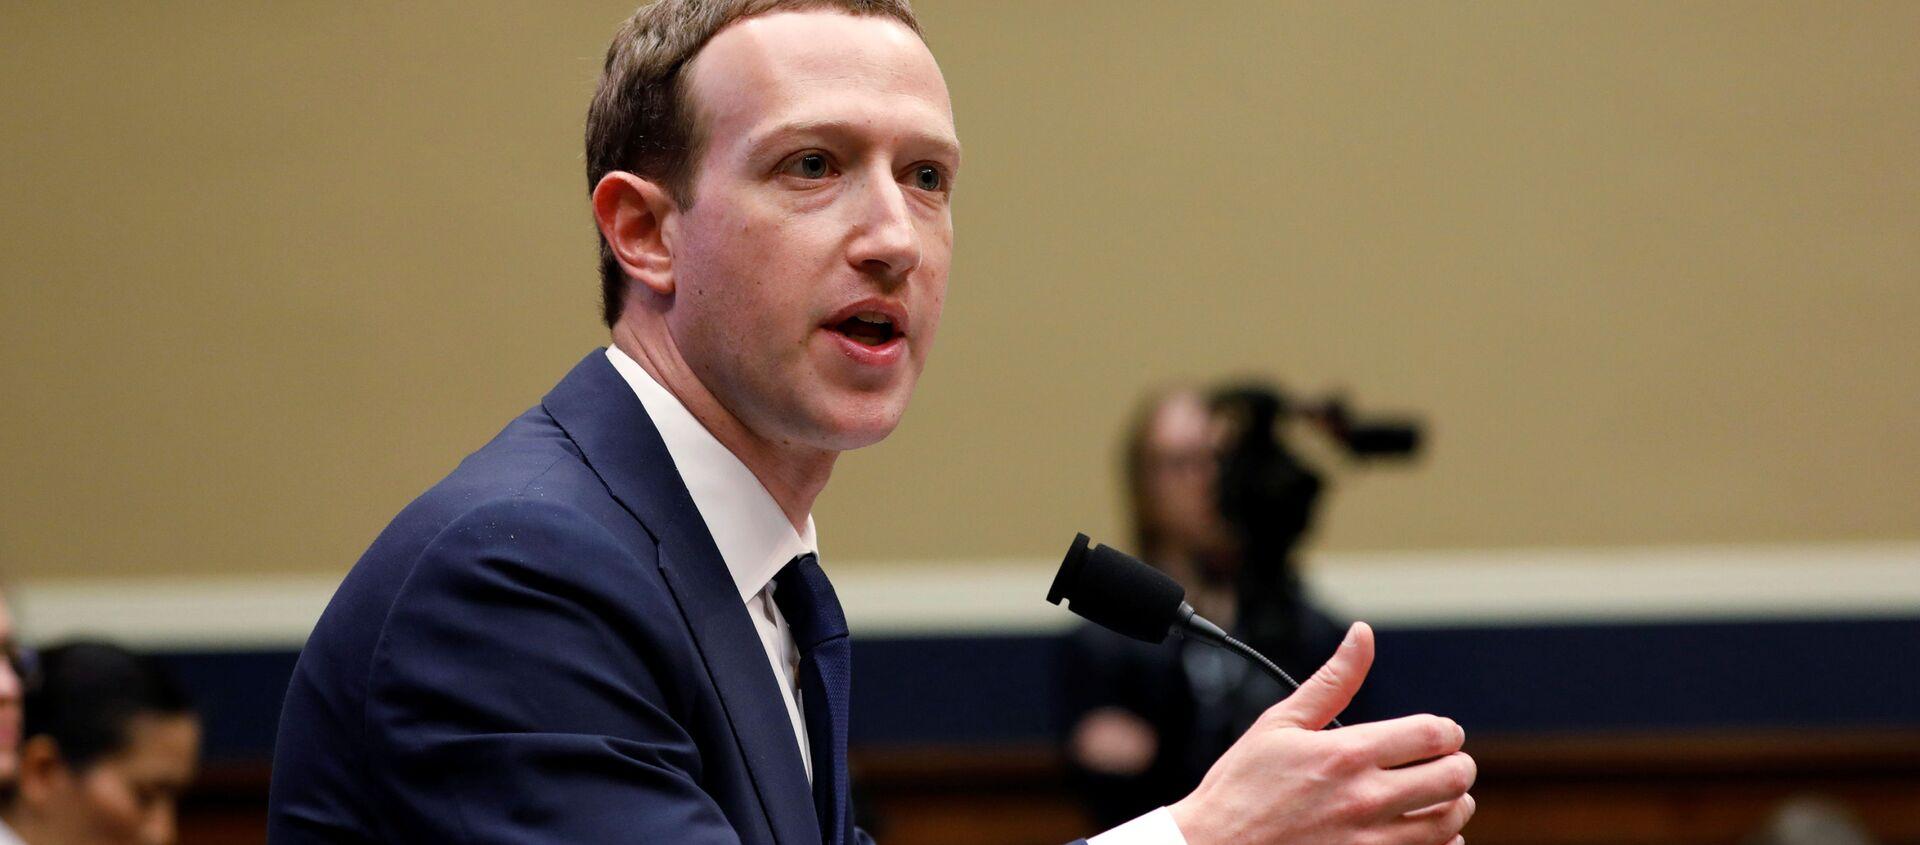 Mark Zuckerberg. - Sputnik Việt Nam, 1920, 30.06.2021